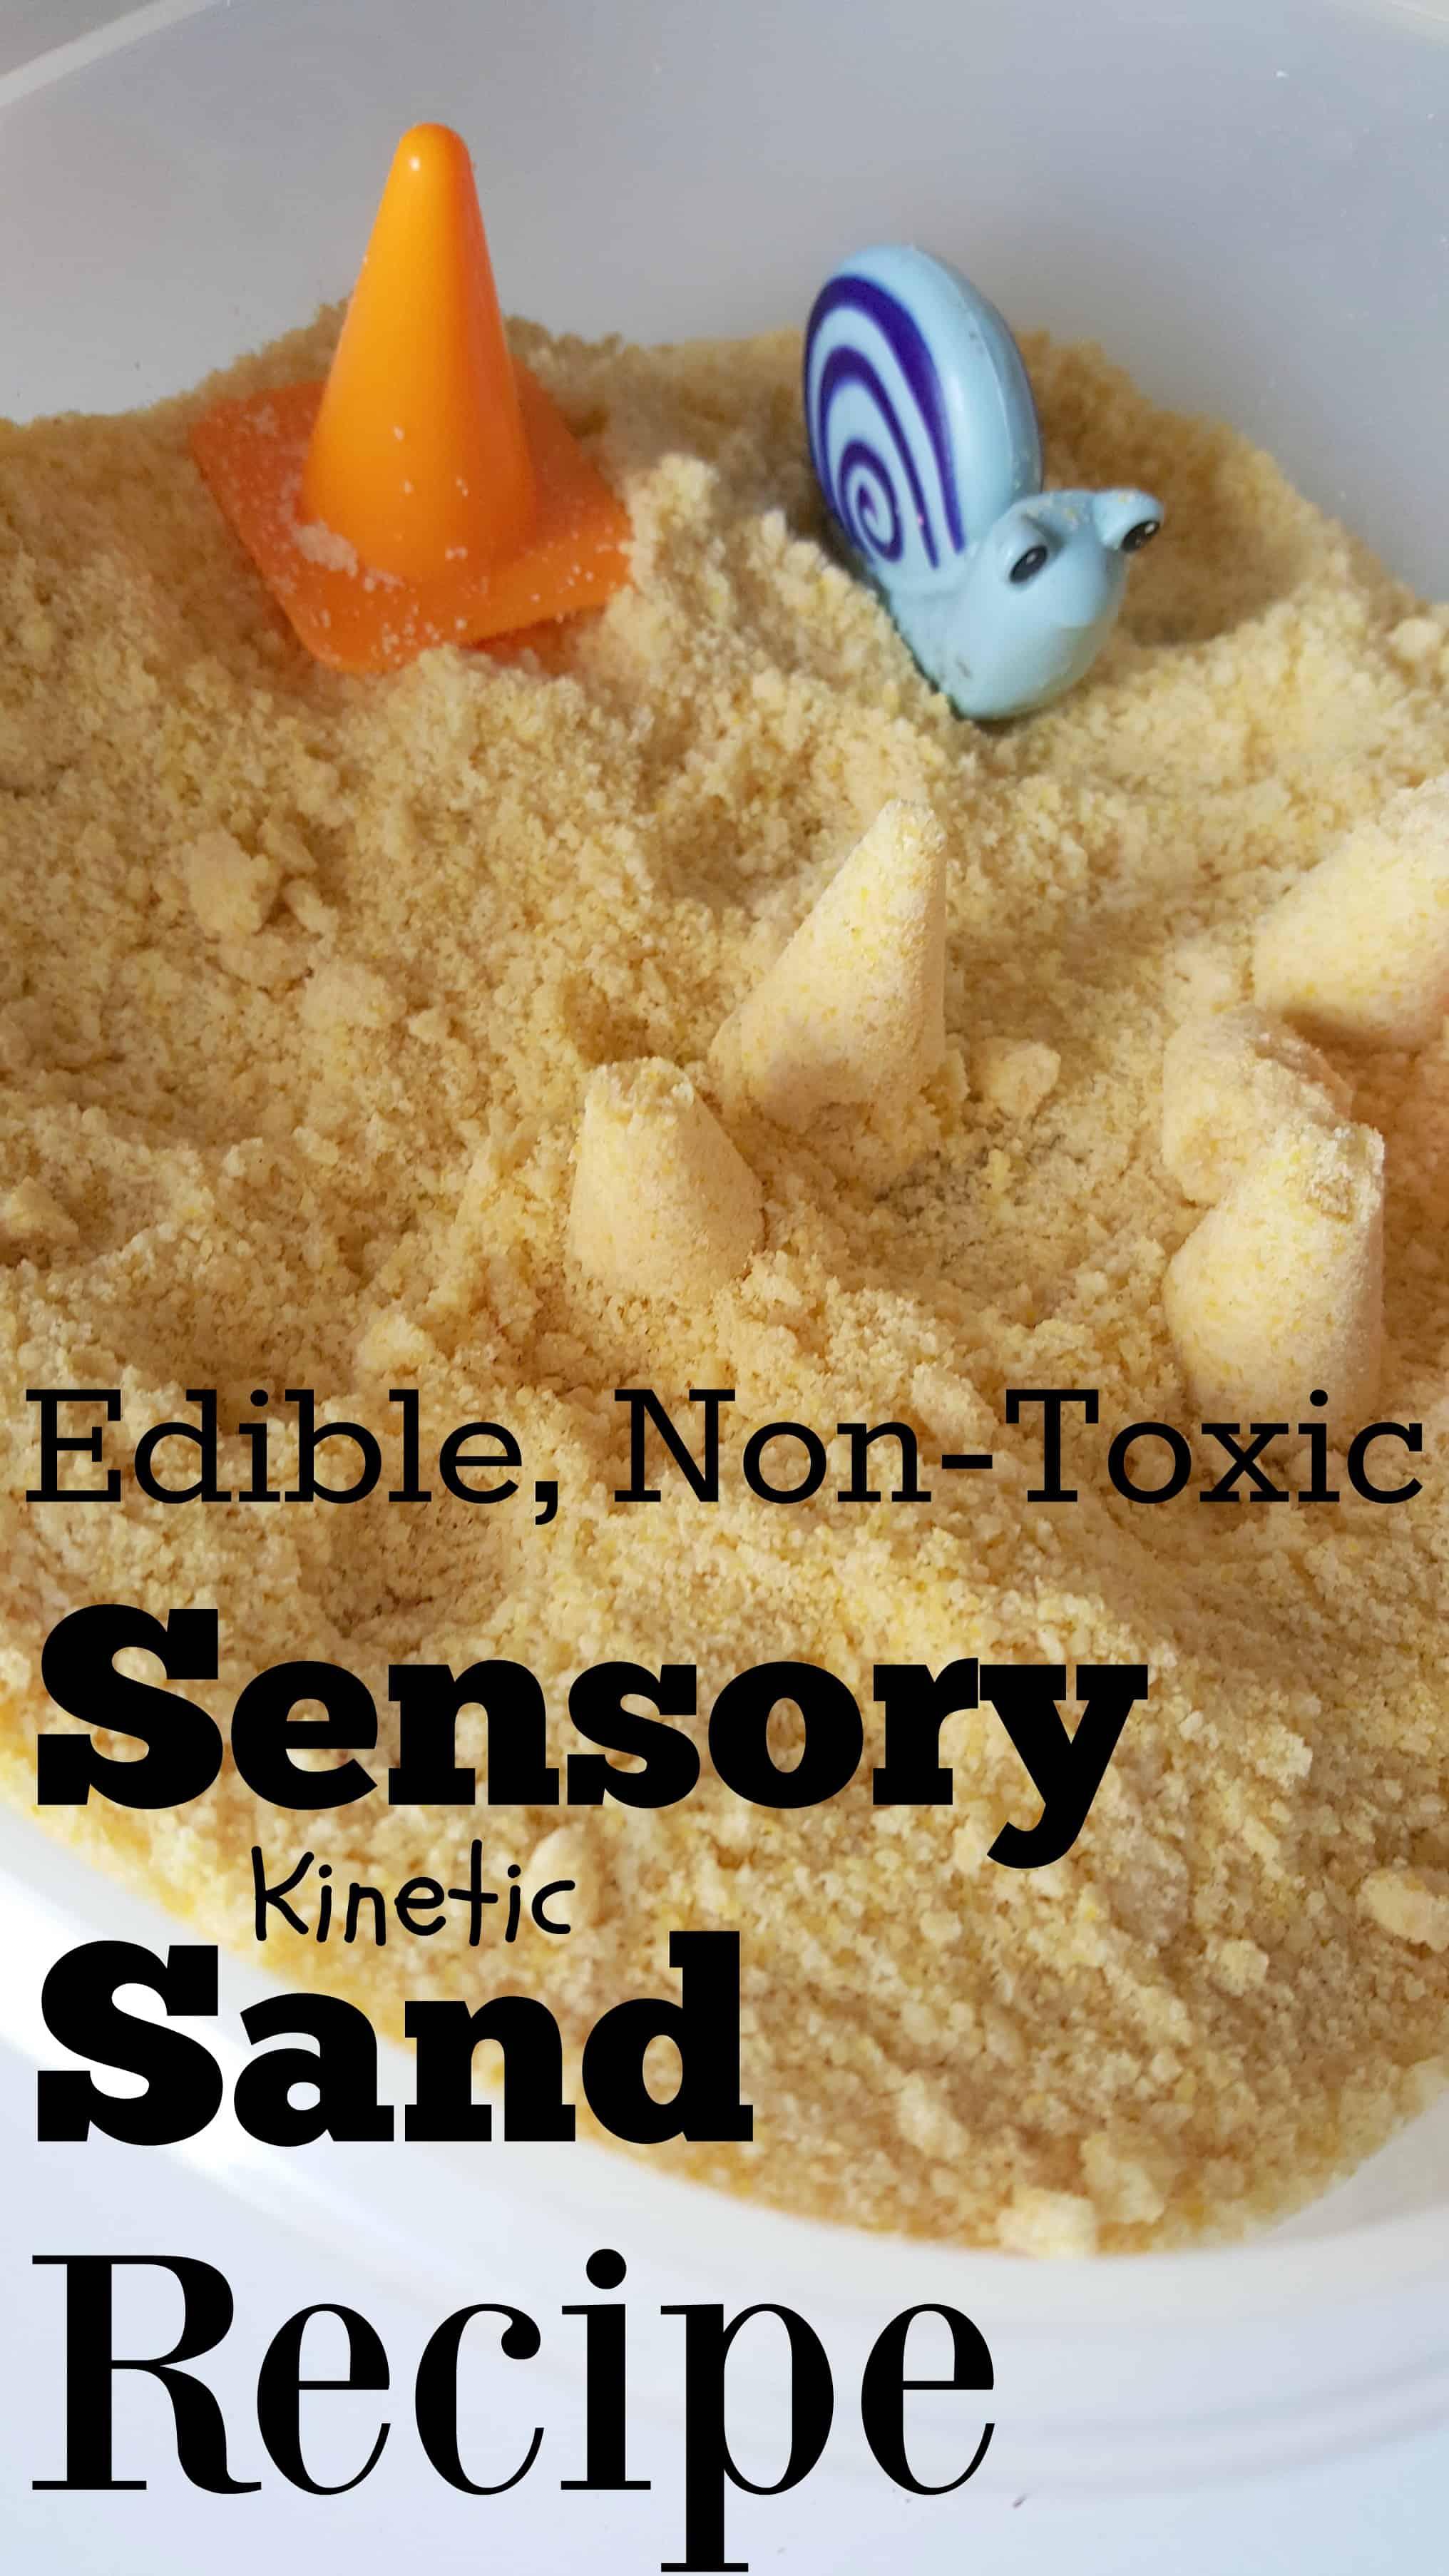 Edible kinetic sand